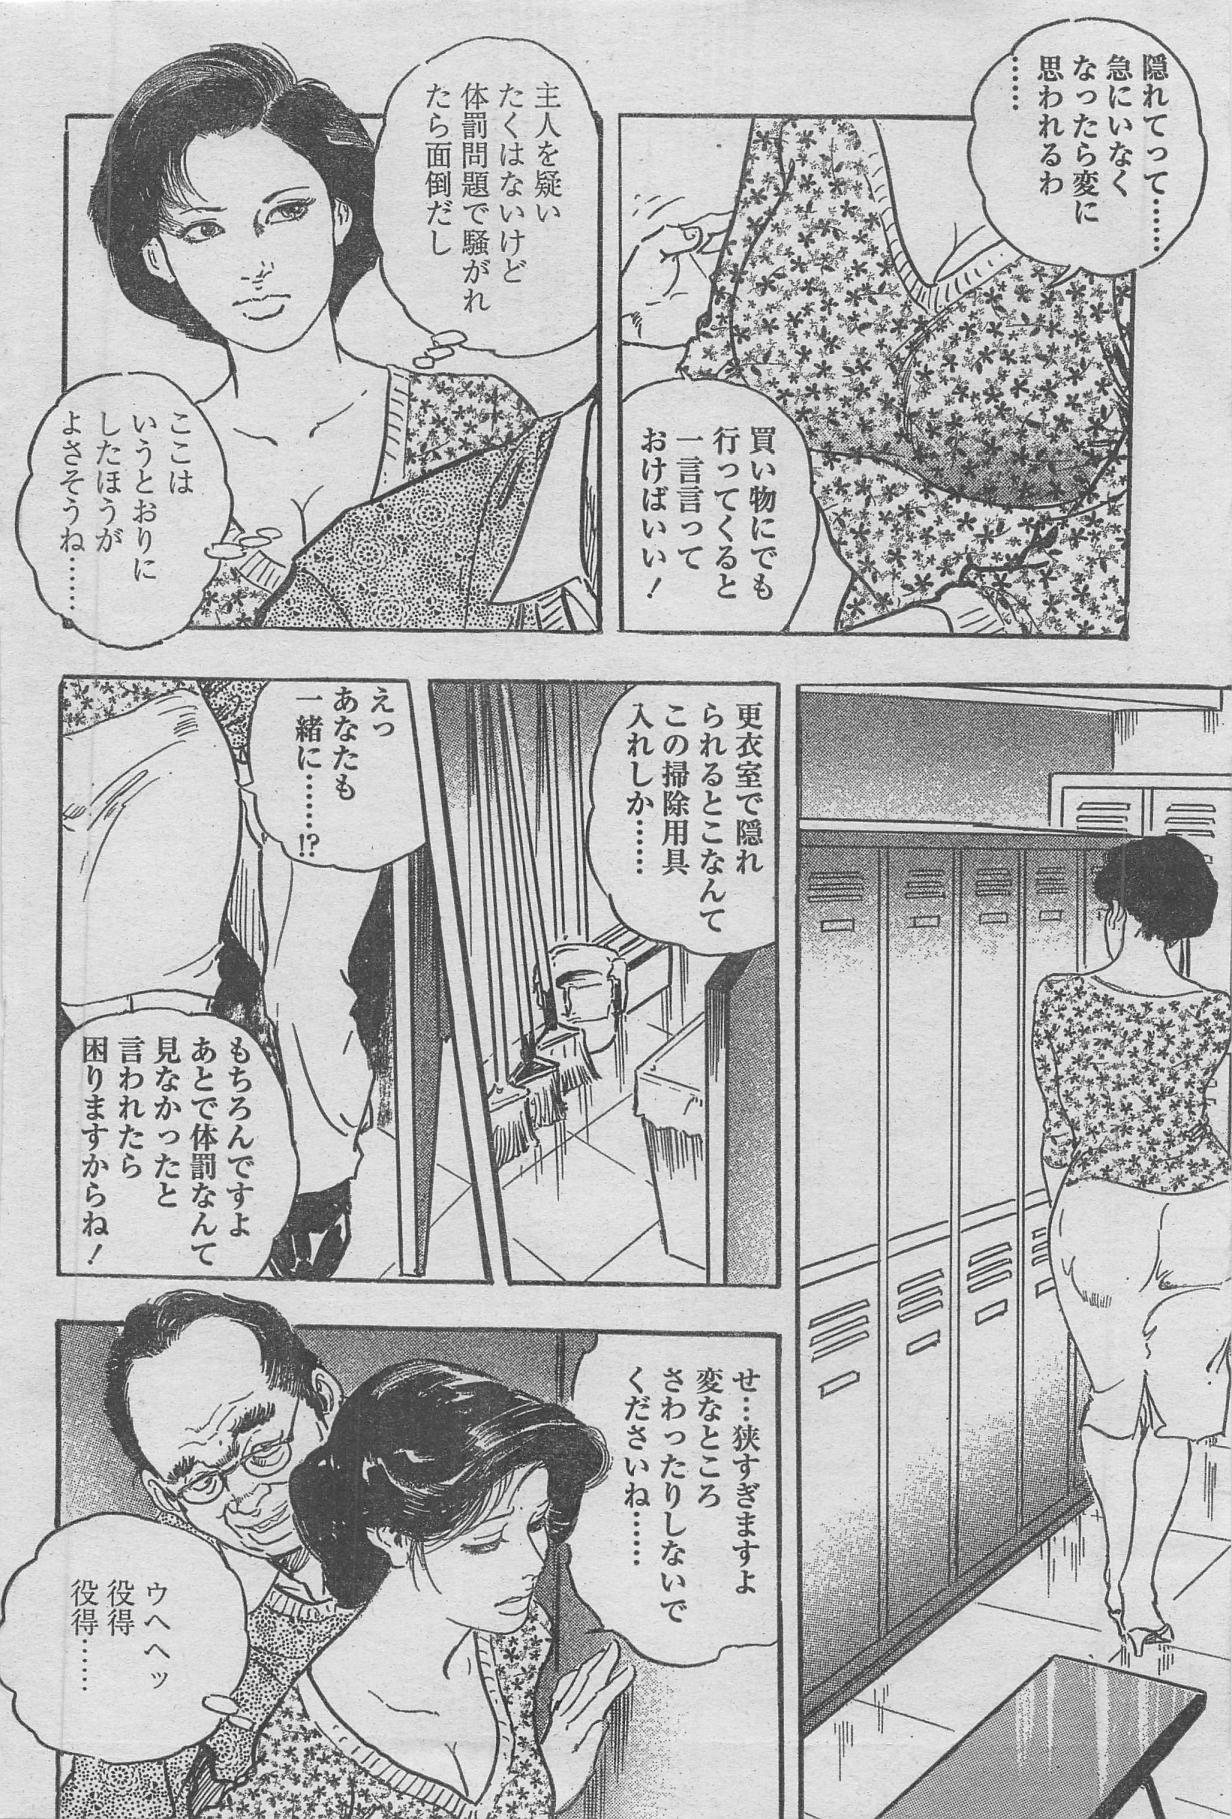 Manga Lawrence 2013-04 153